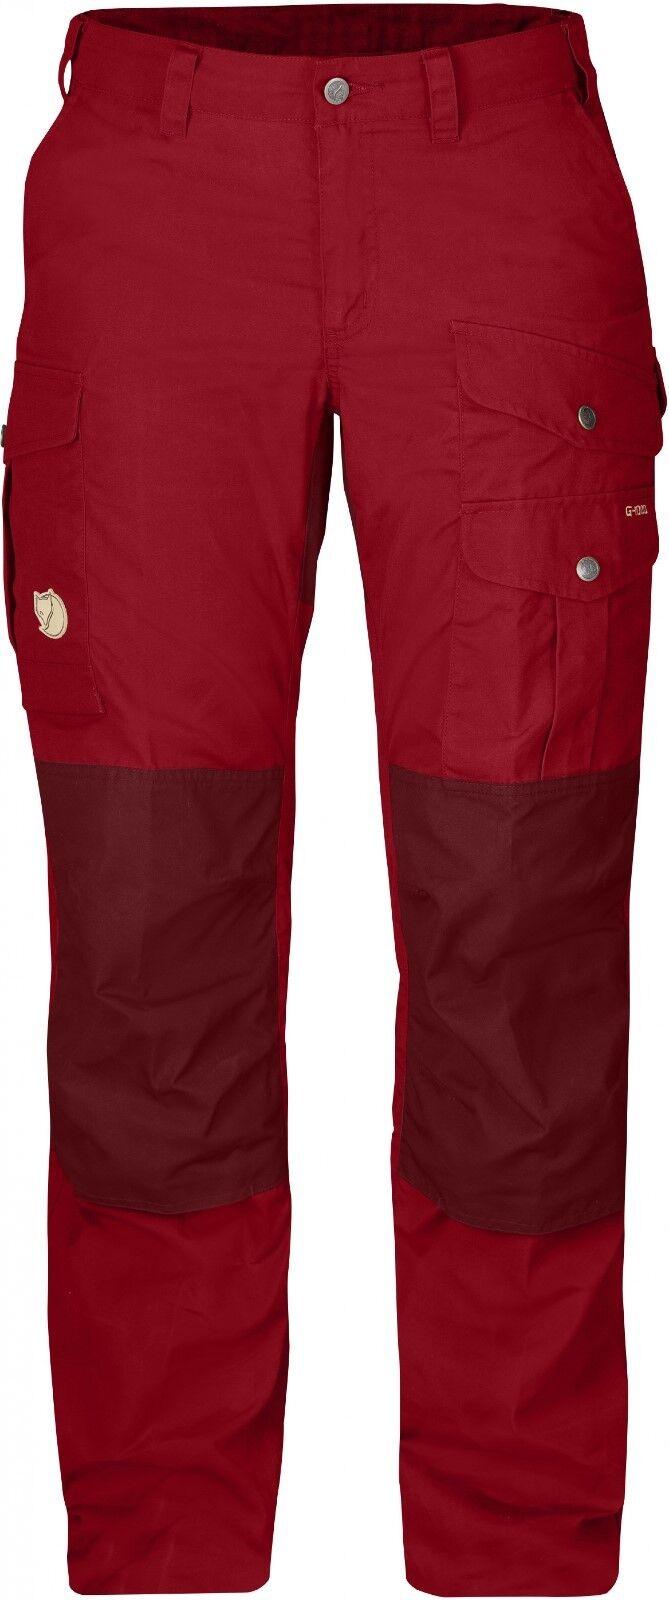 Fjäll Räven Barents Pro Damens Trousers, Damenhose aus G-1000, deep ROT